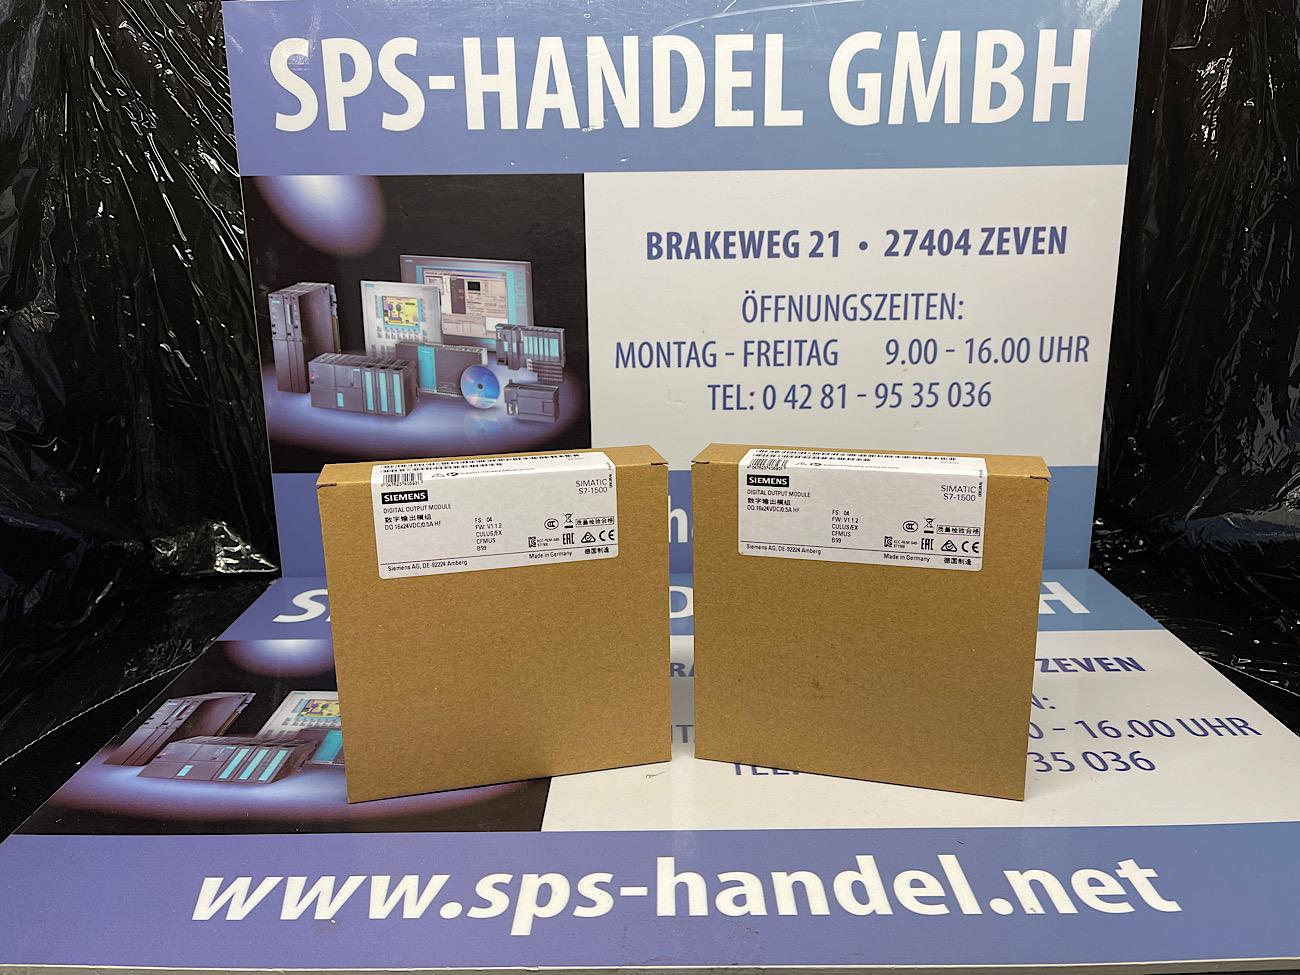 6ES7522-5HH00-0AB0 | DQ 16x 230V AC/2A ST | NEU Siegel 26%